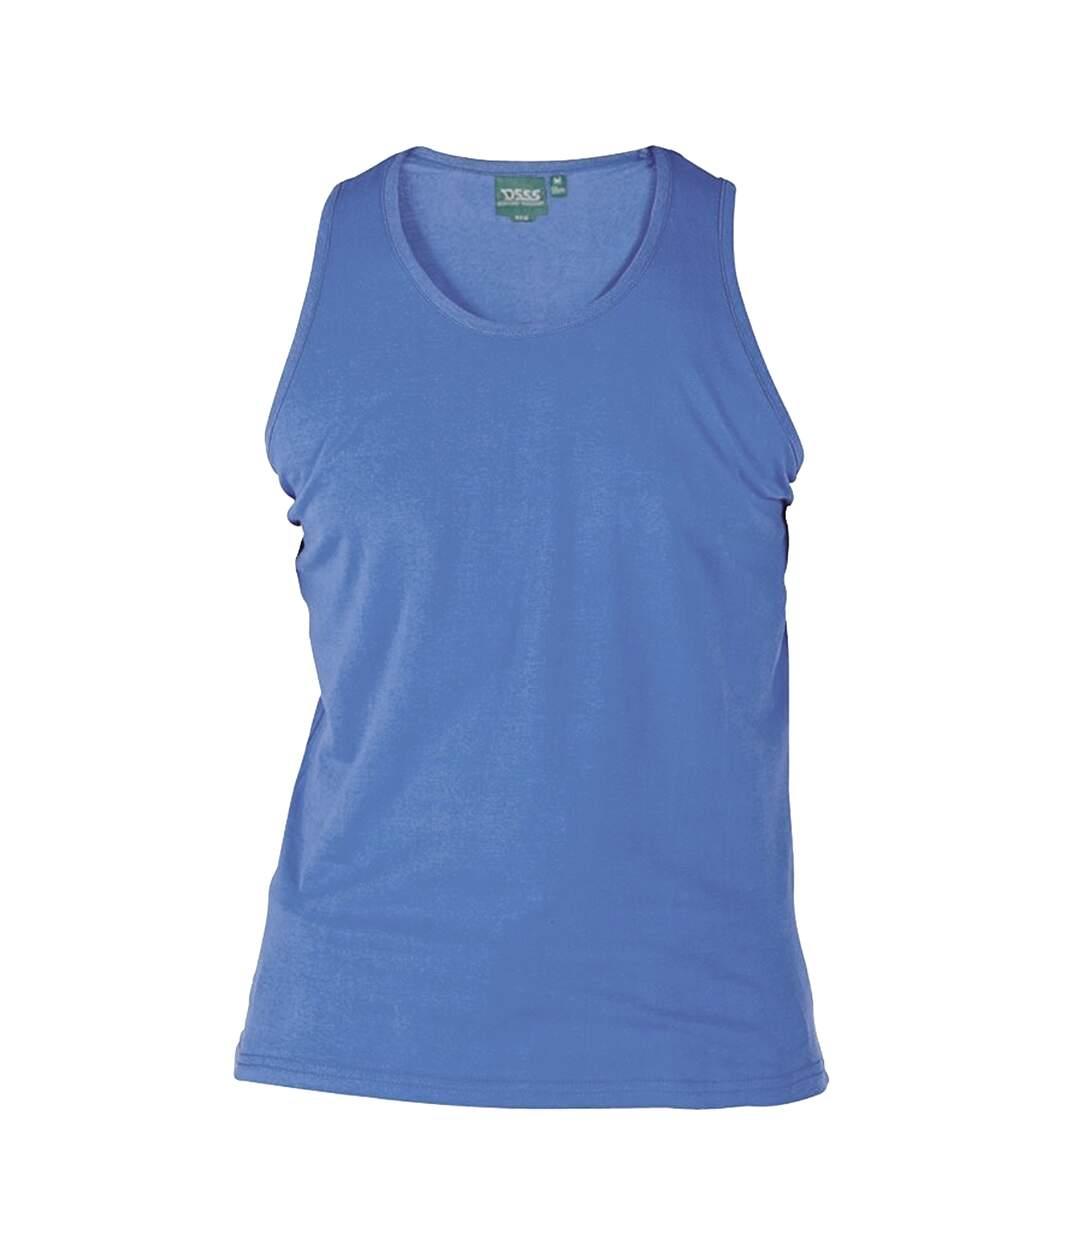 Duke Mens Fabio-2 Kingsize Muscle Vest (Blue) - UTDC172